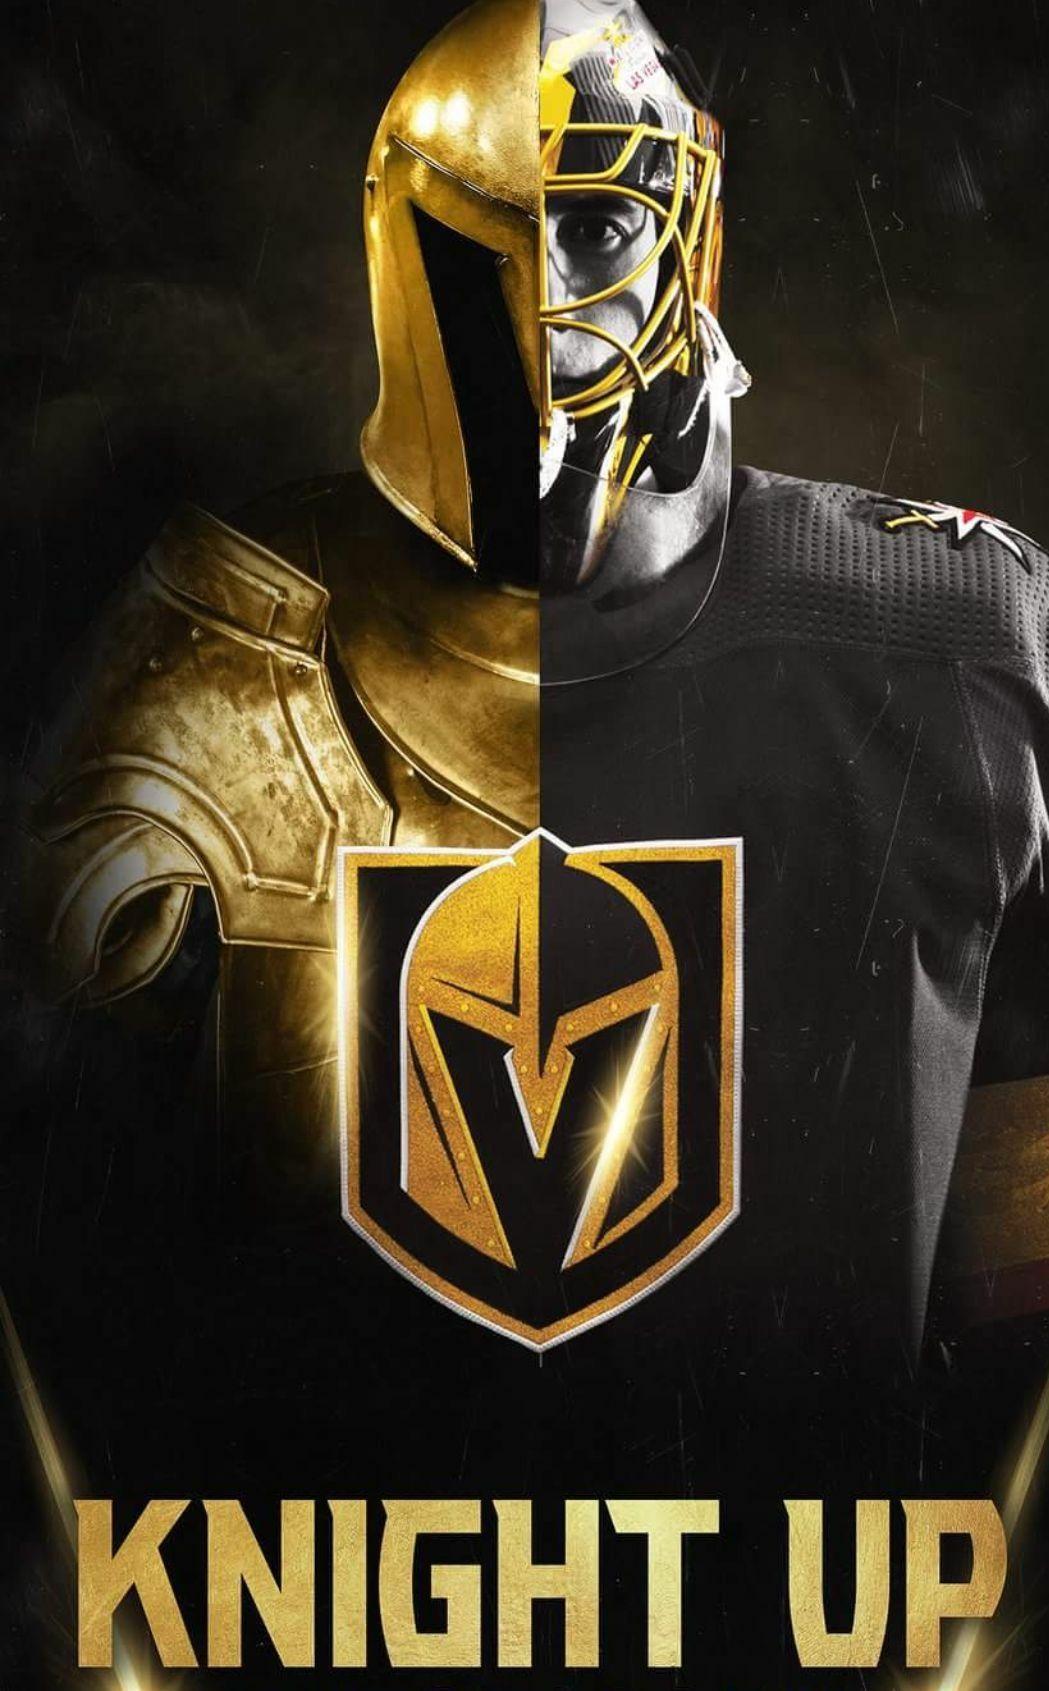 When Rising up isn't enough! | Vegas golden knights logo, Vegas golden knights, Golden knights hockey